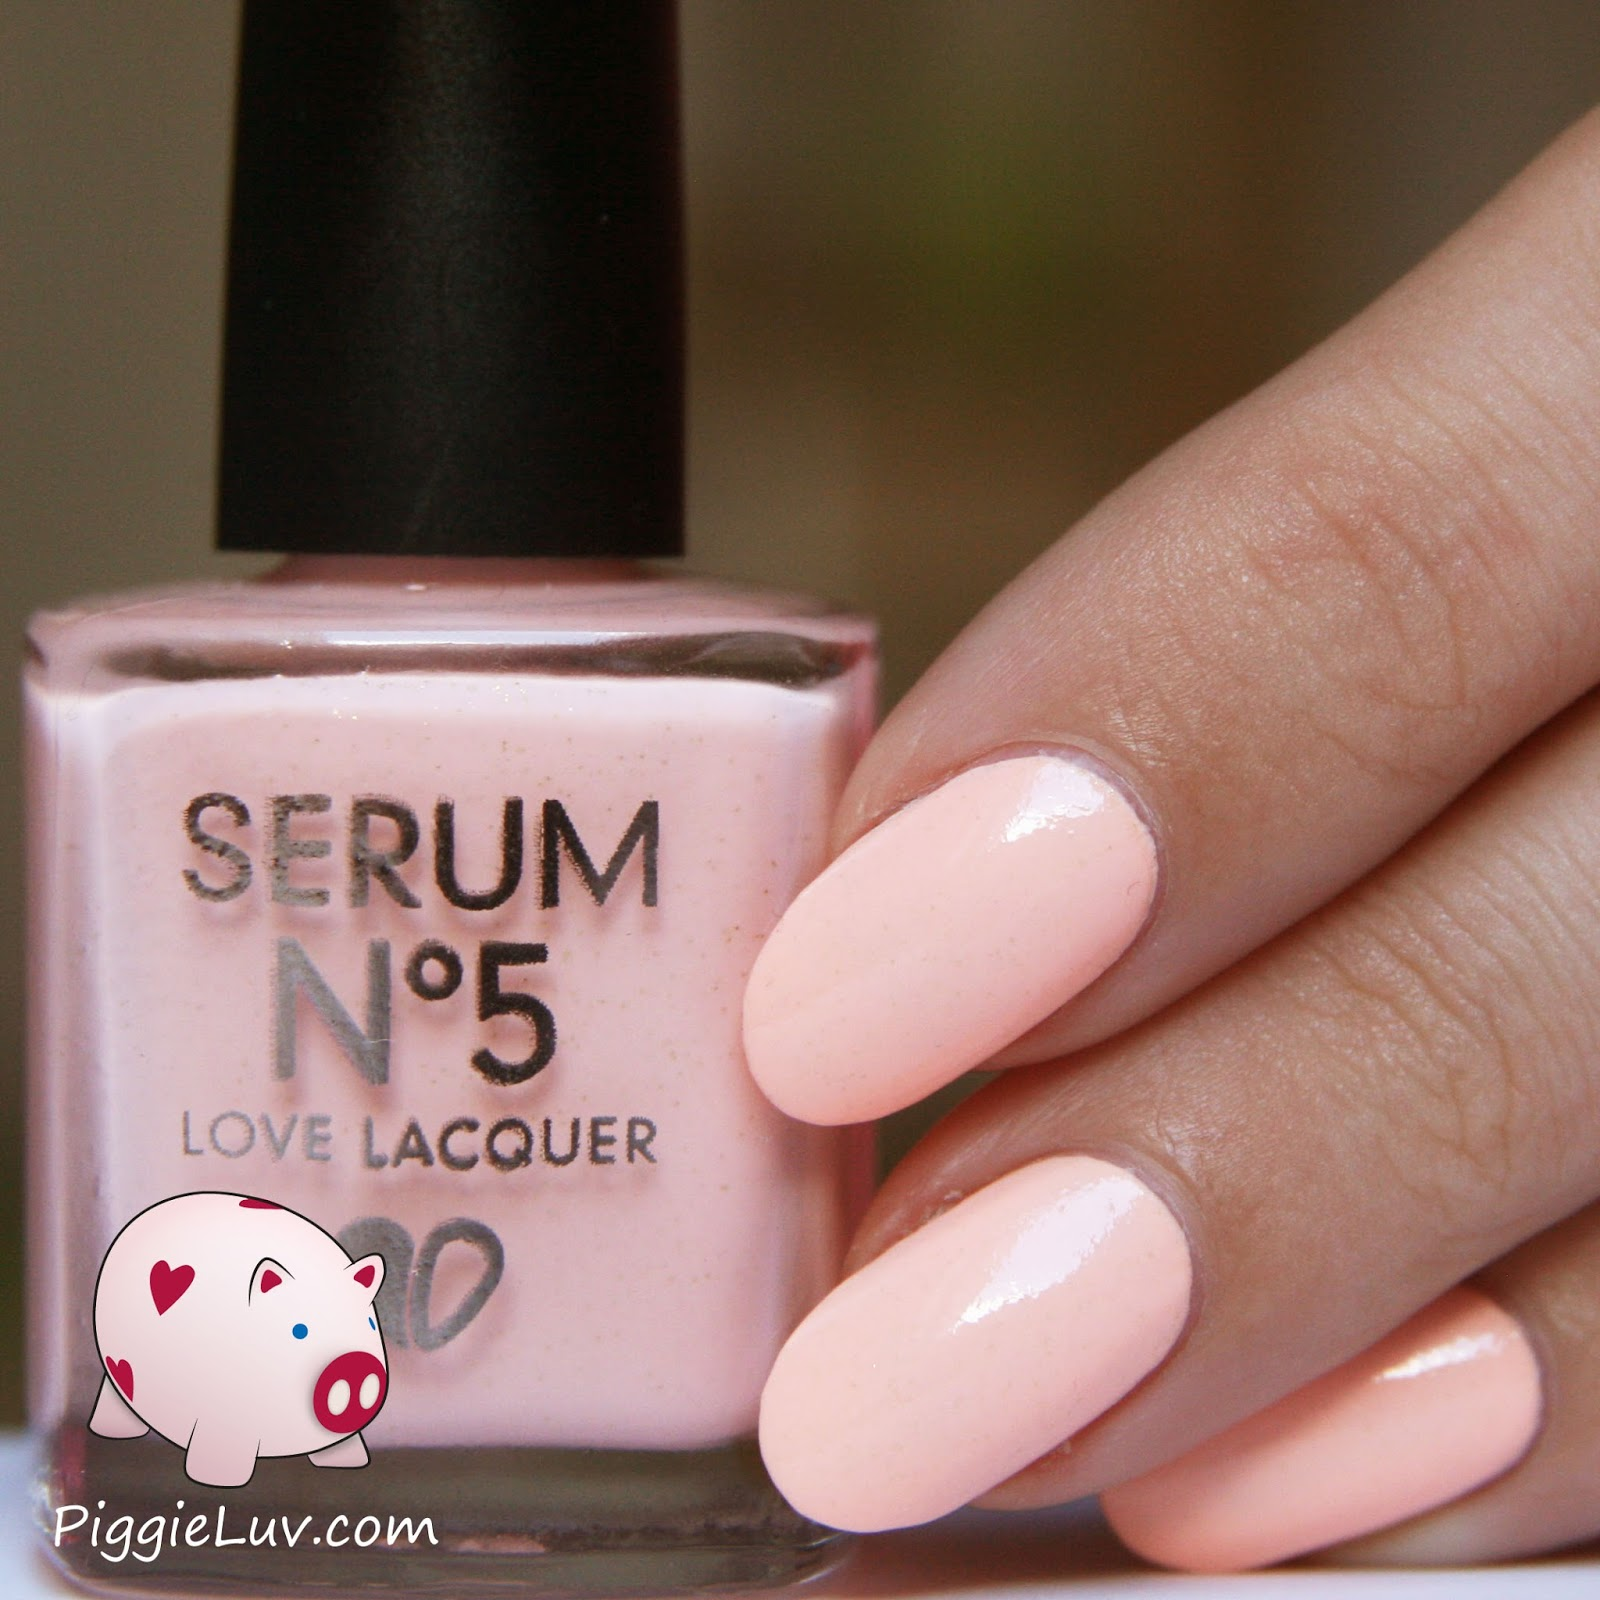 PiggieLuv: Serum No. 5 is glowing places!!!